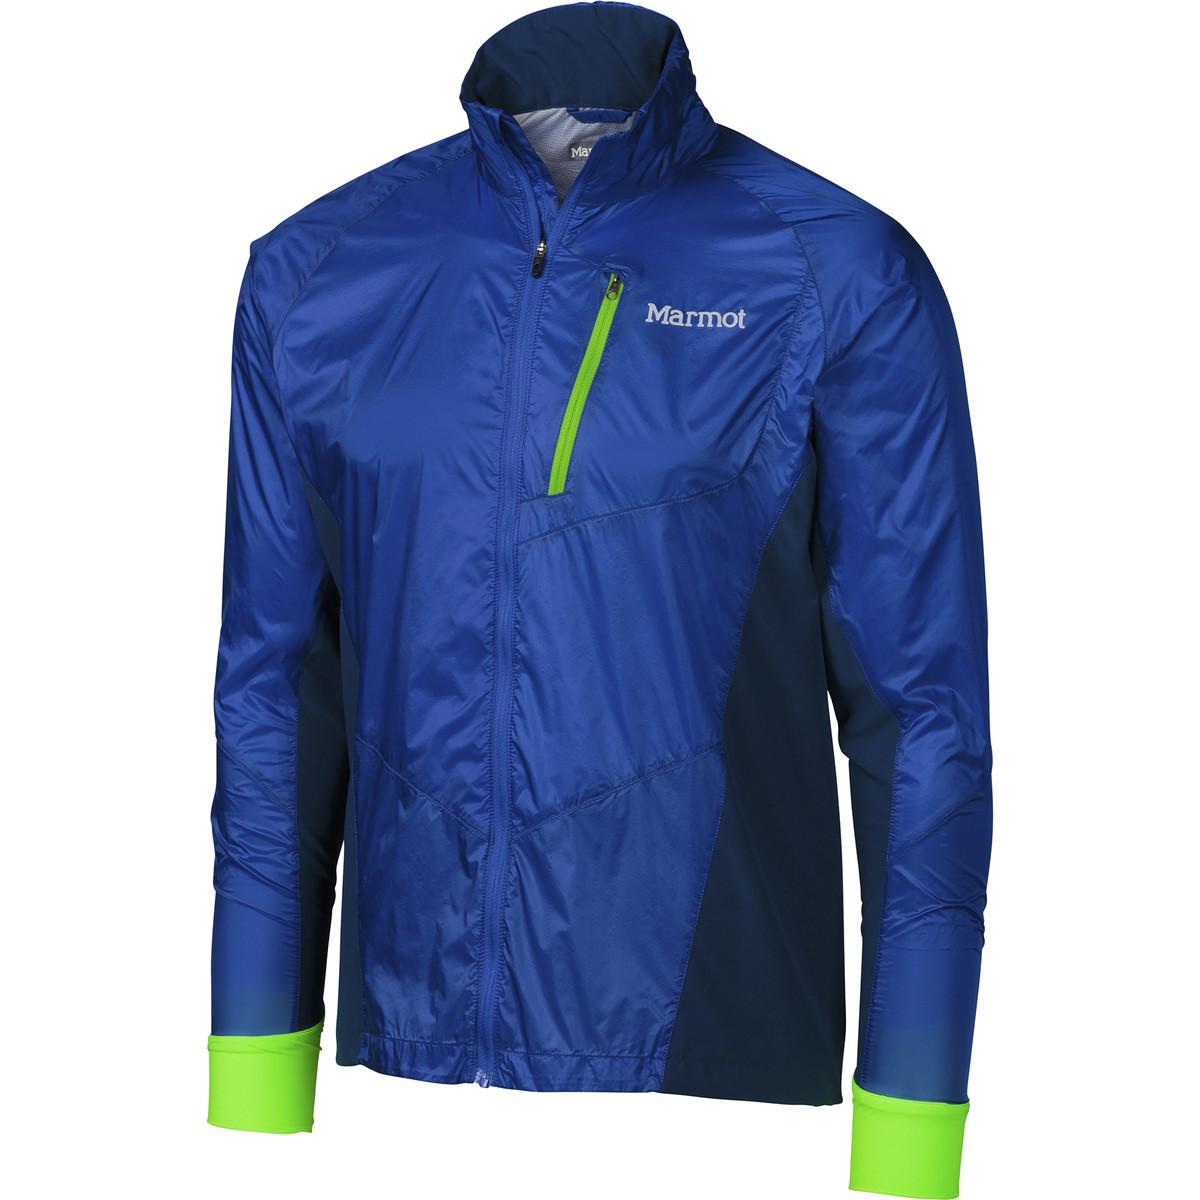 photo: Marmot Northshore Jacket component (3-in-1) jacket